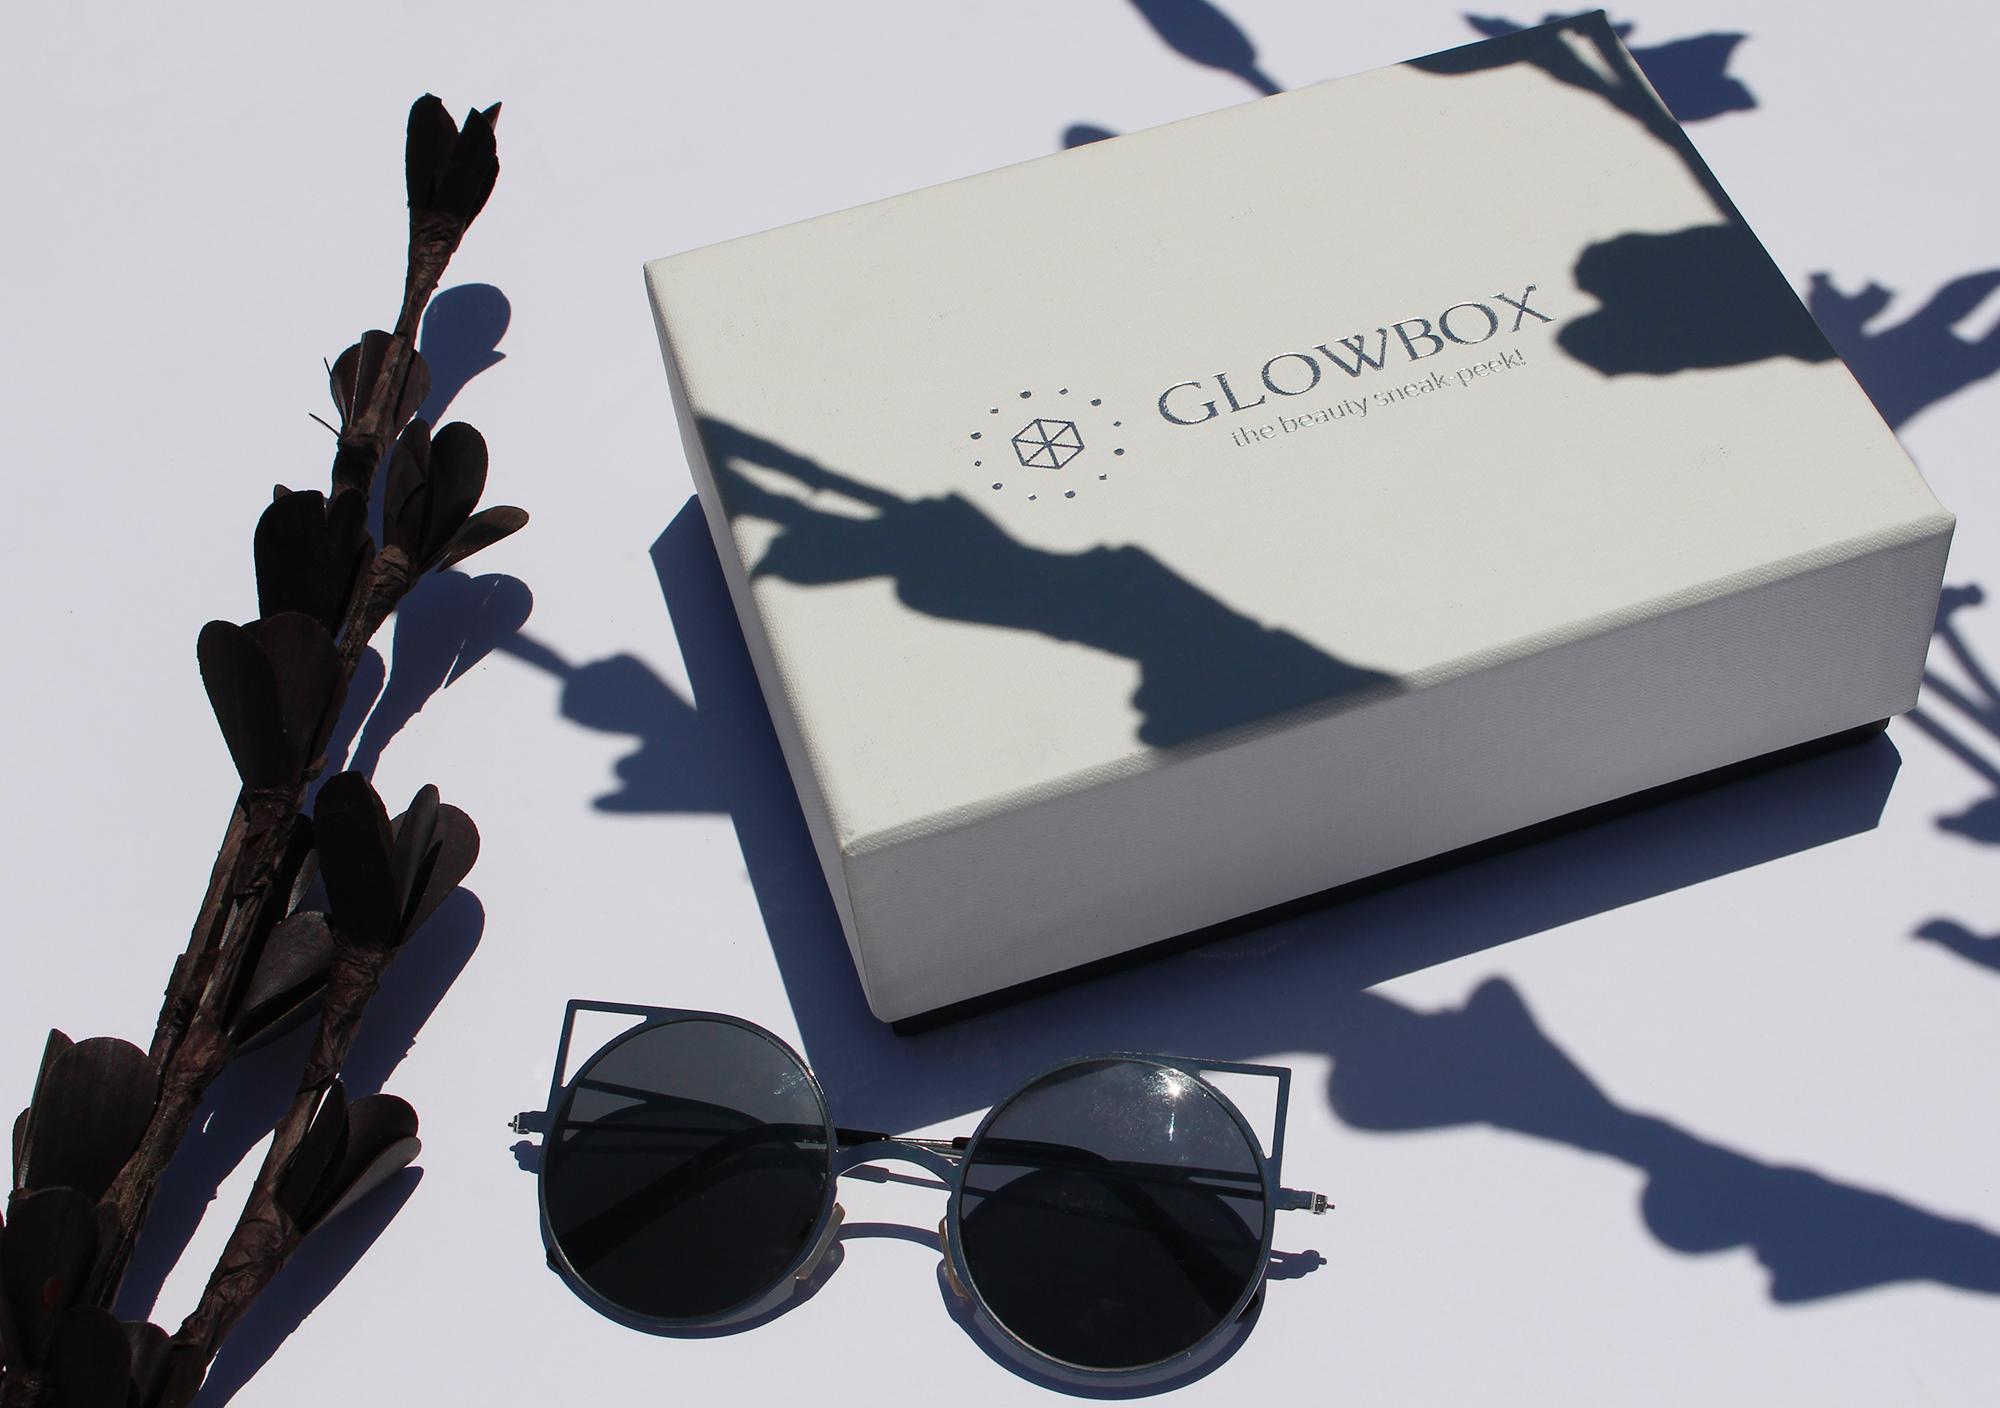 glowbox-review